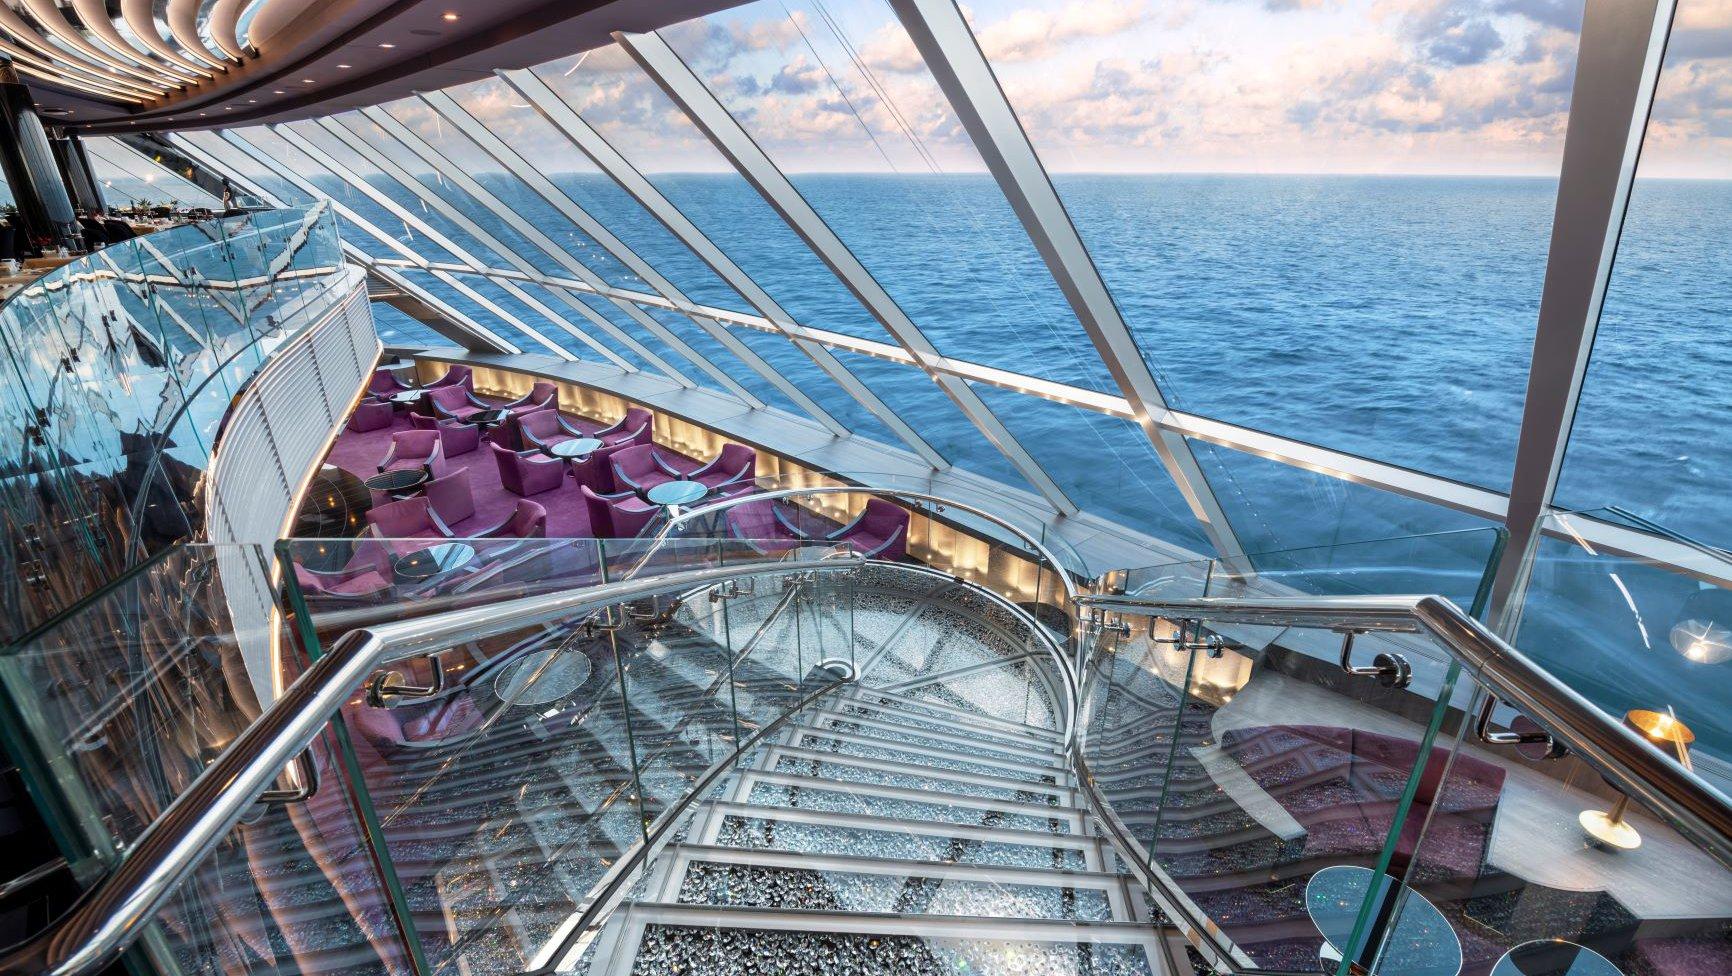 virtuosa-top-sail-lounge.jpg